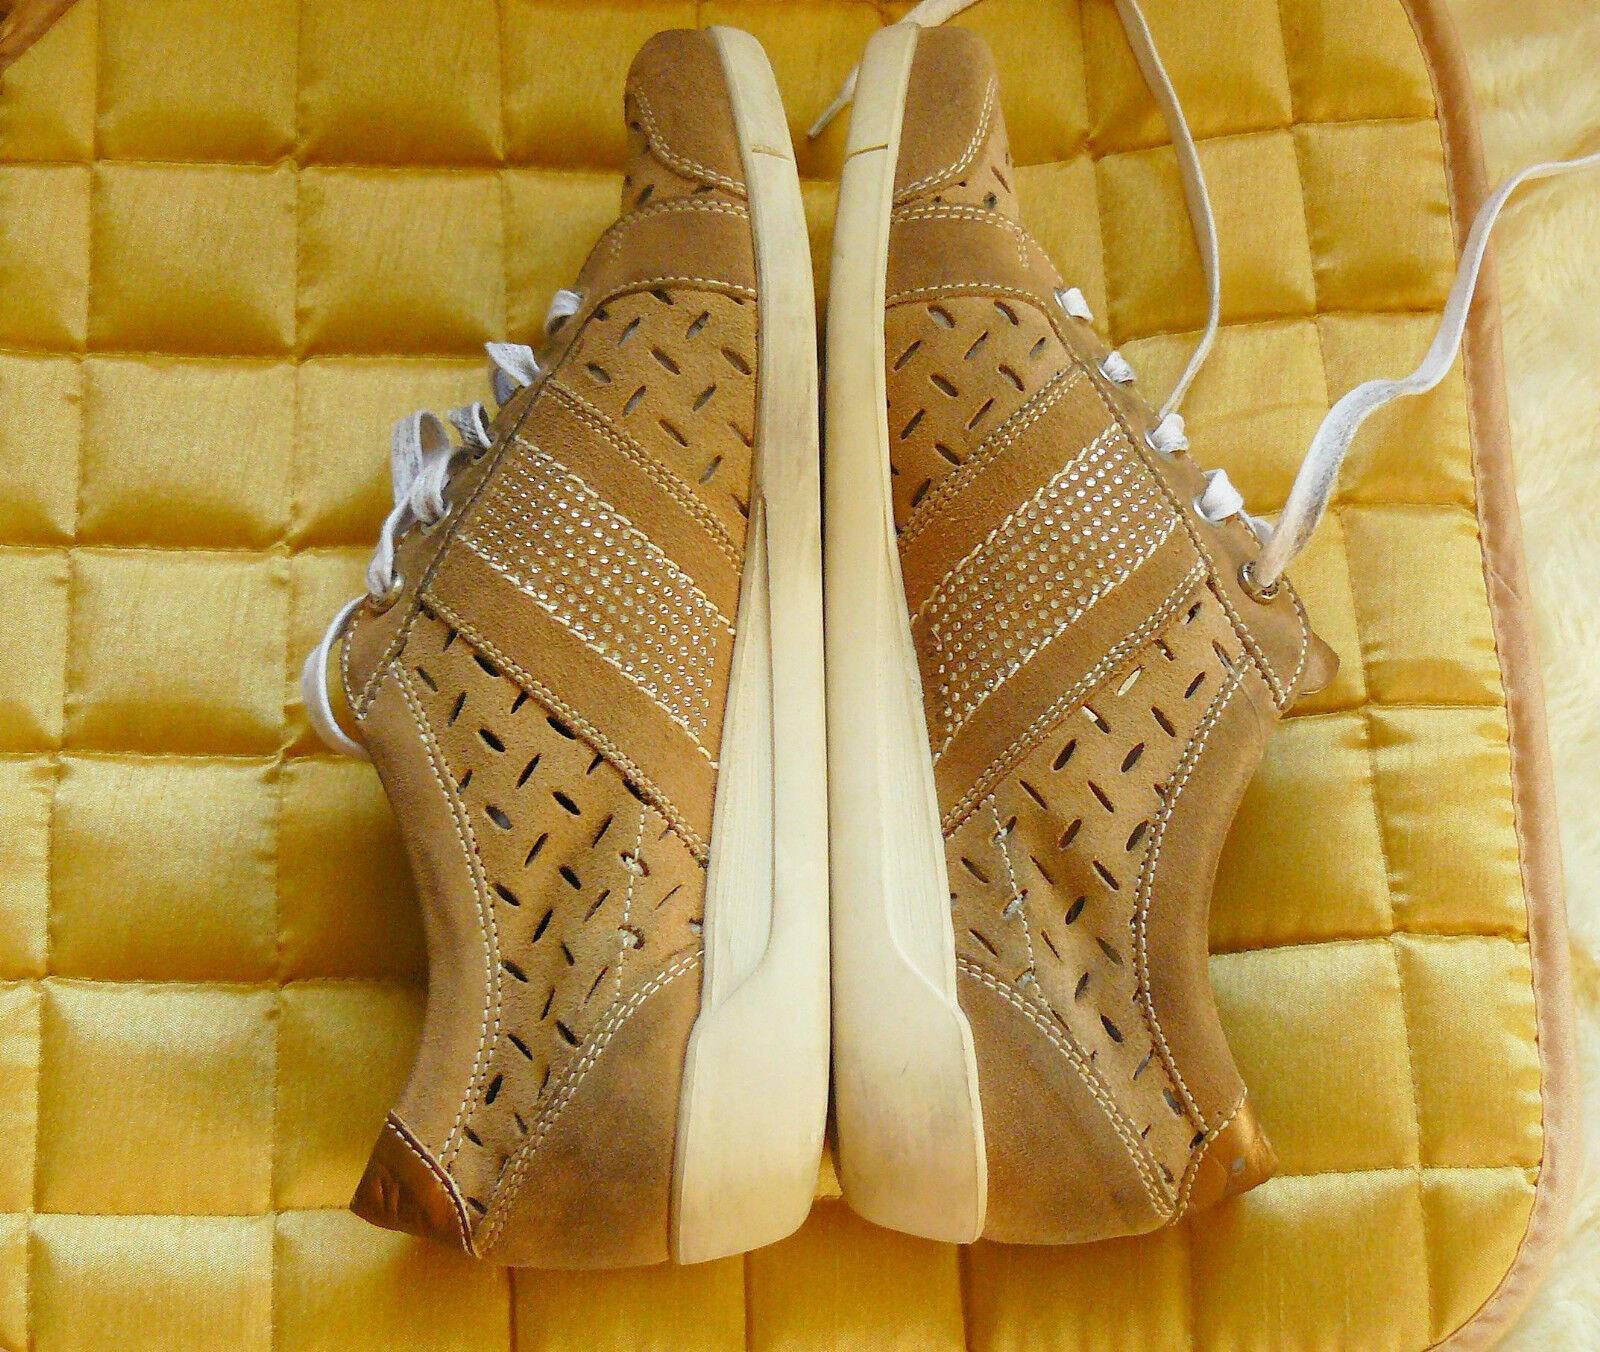 Janet Sport Gr  39  Gr Sneakers echt Leder  Beige Gold NEU  NP. 170 Euro 6ba080